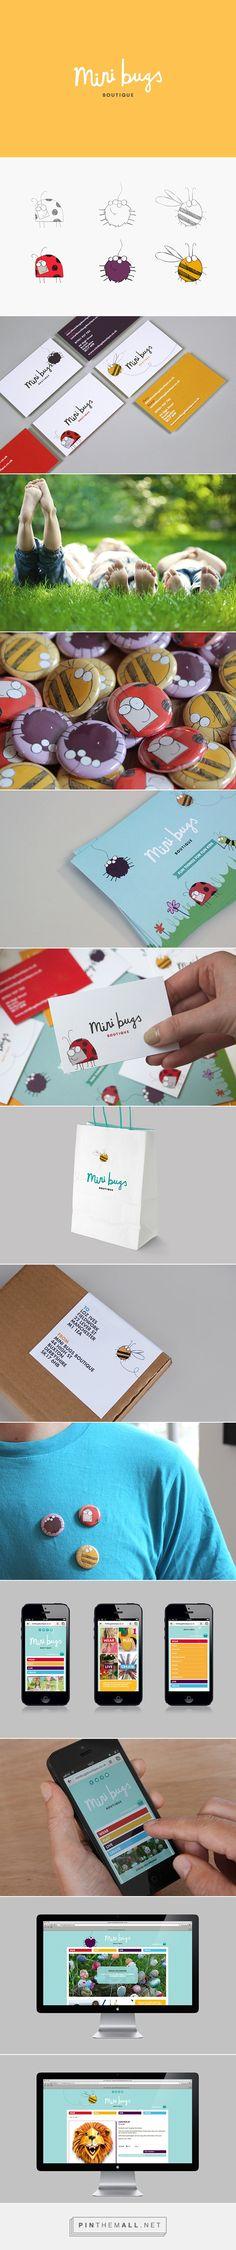 Mini Bugs Branding on Behance - created via https://pinthemall.net